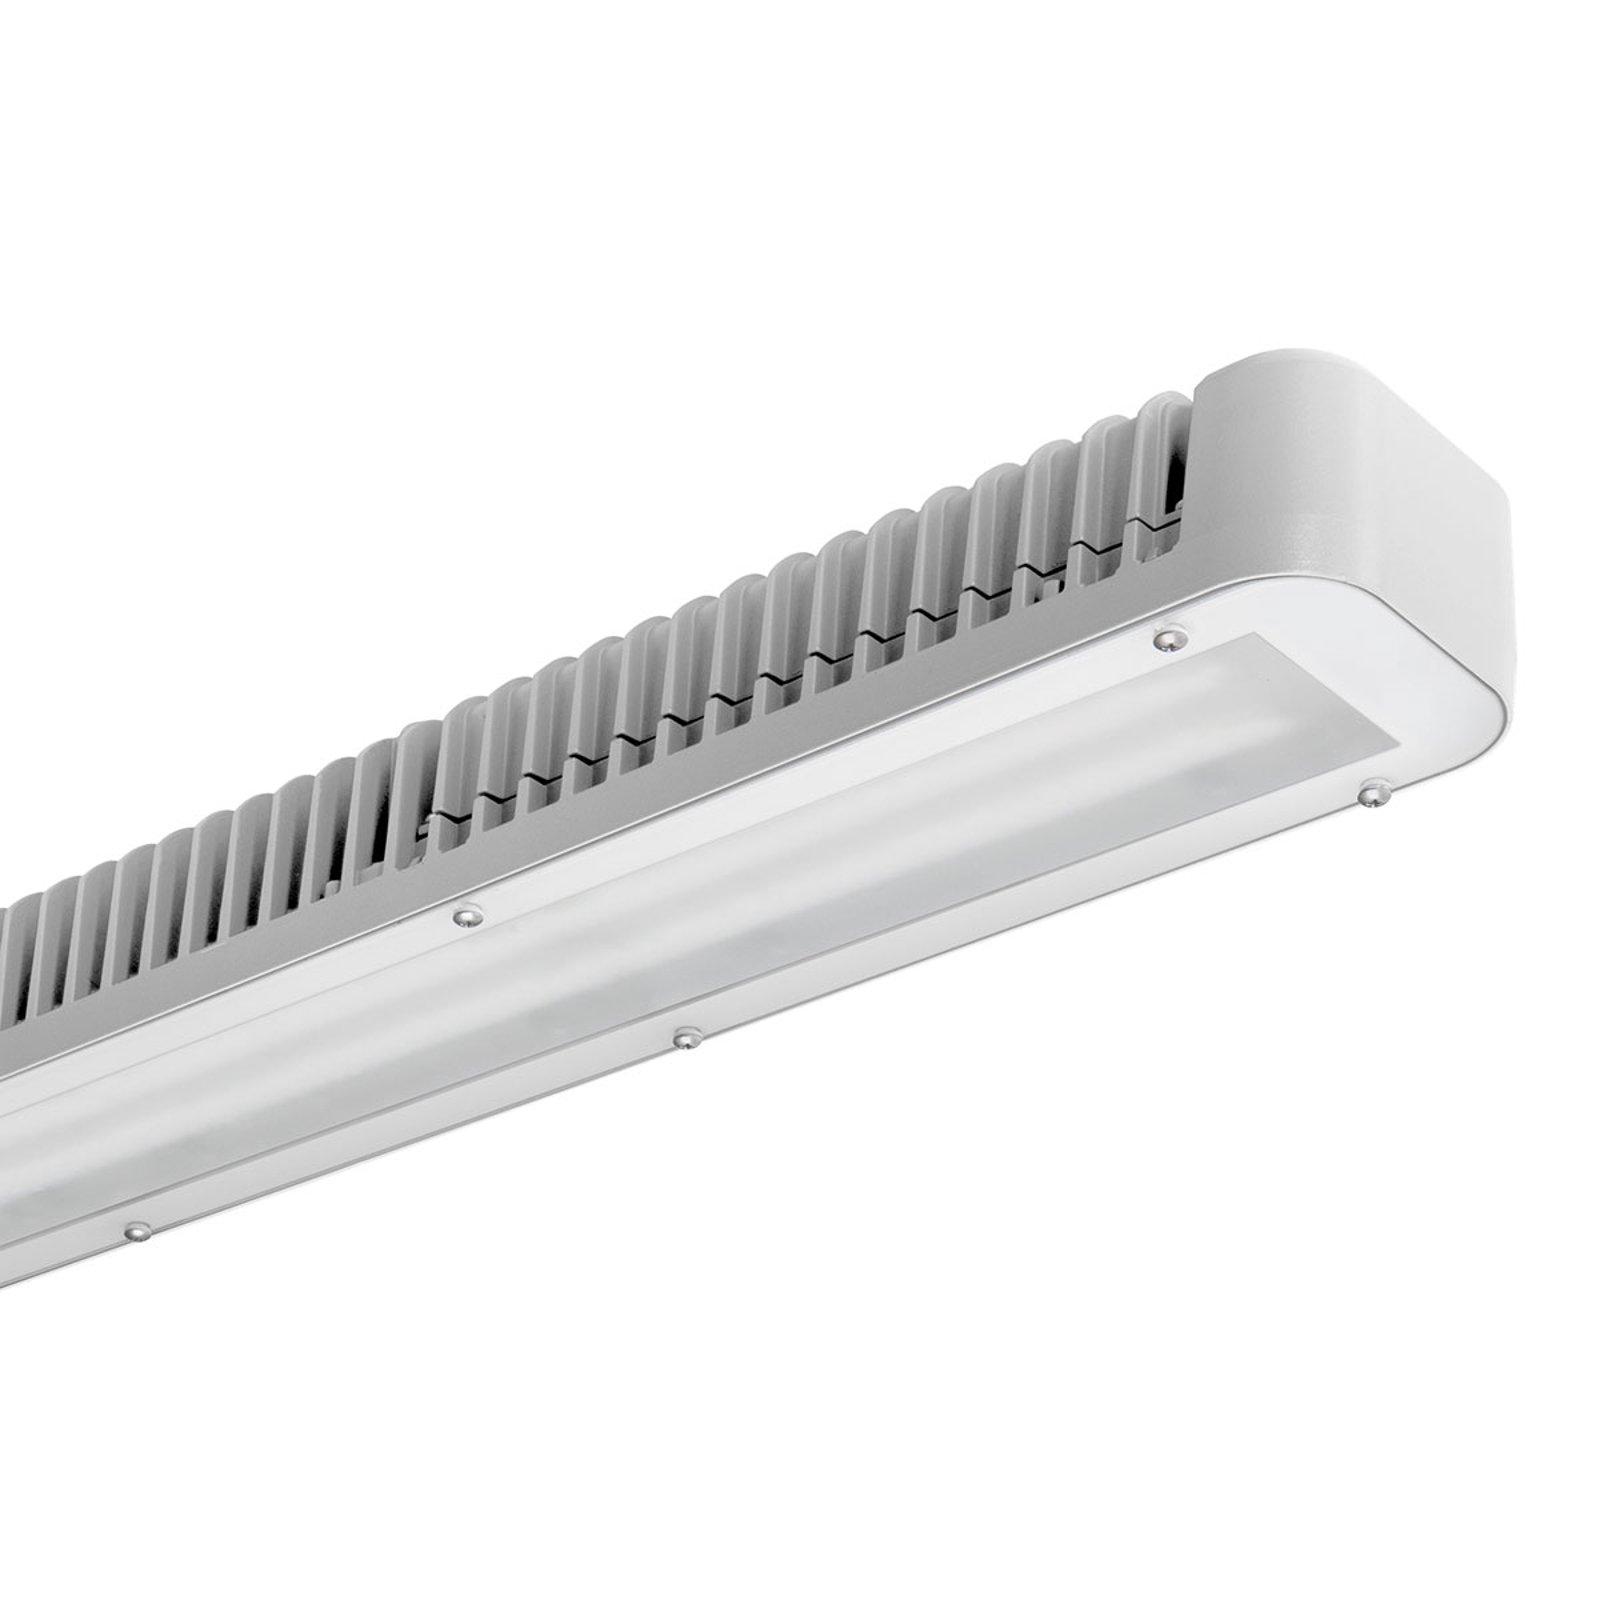 LED-taklampe Koa Line STR/GL S/EW 112W